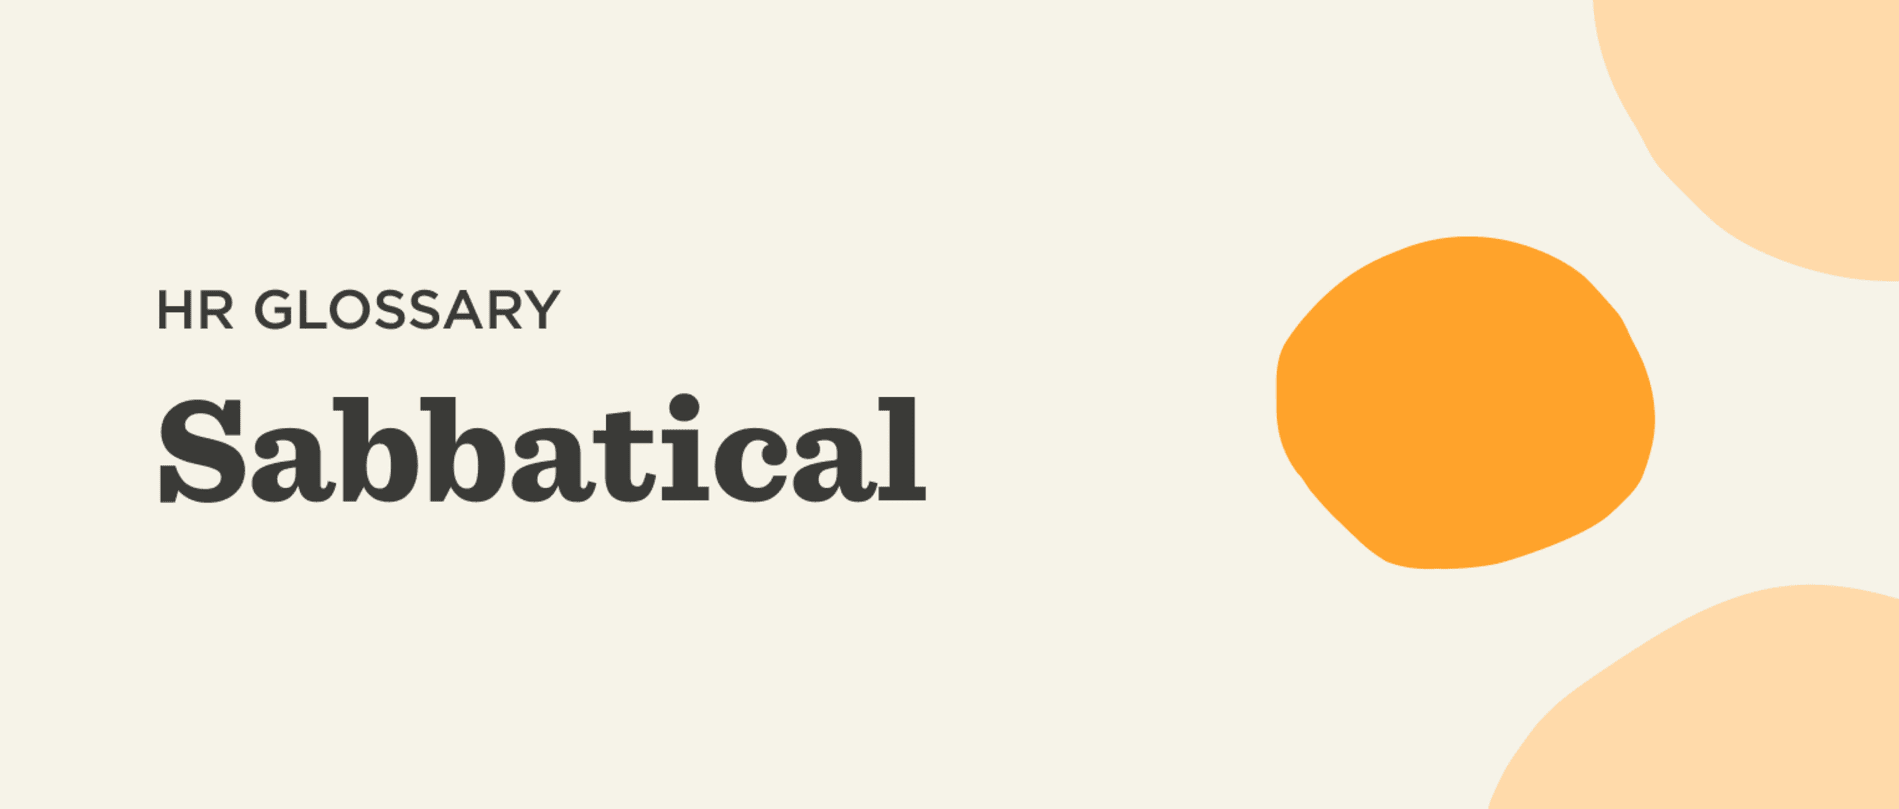 Sabbatical-Glossary-banner